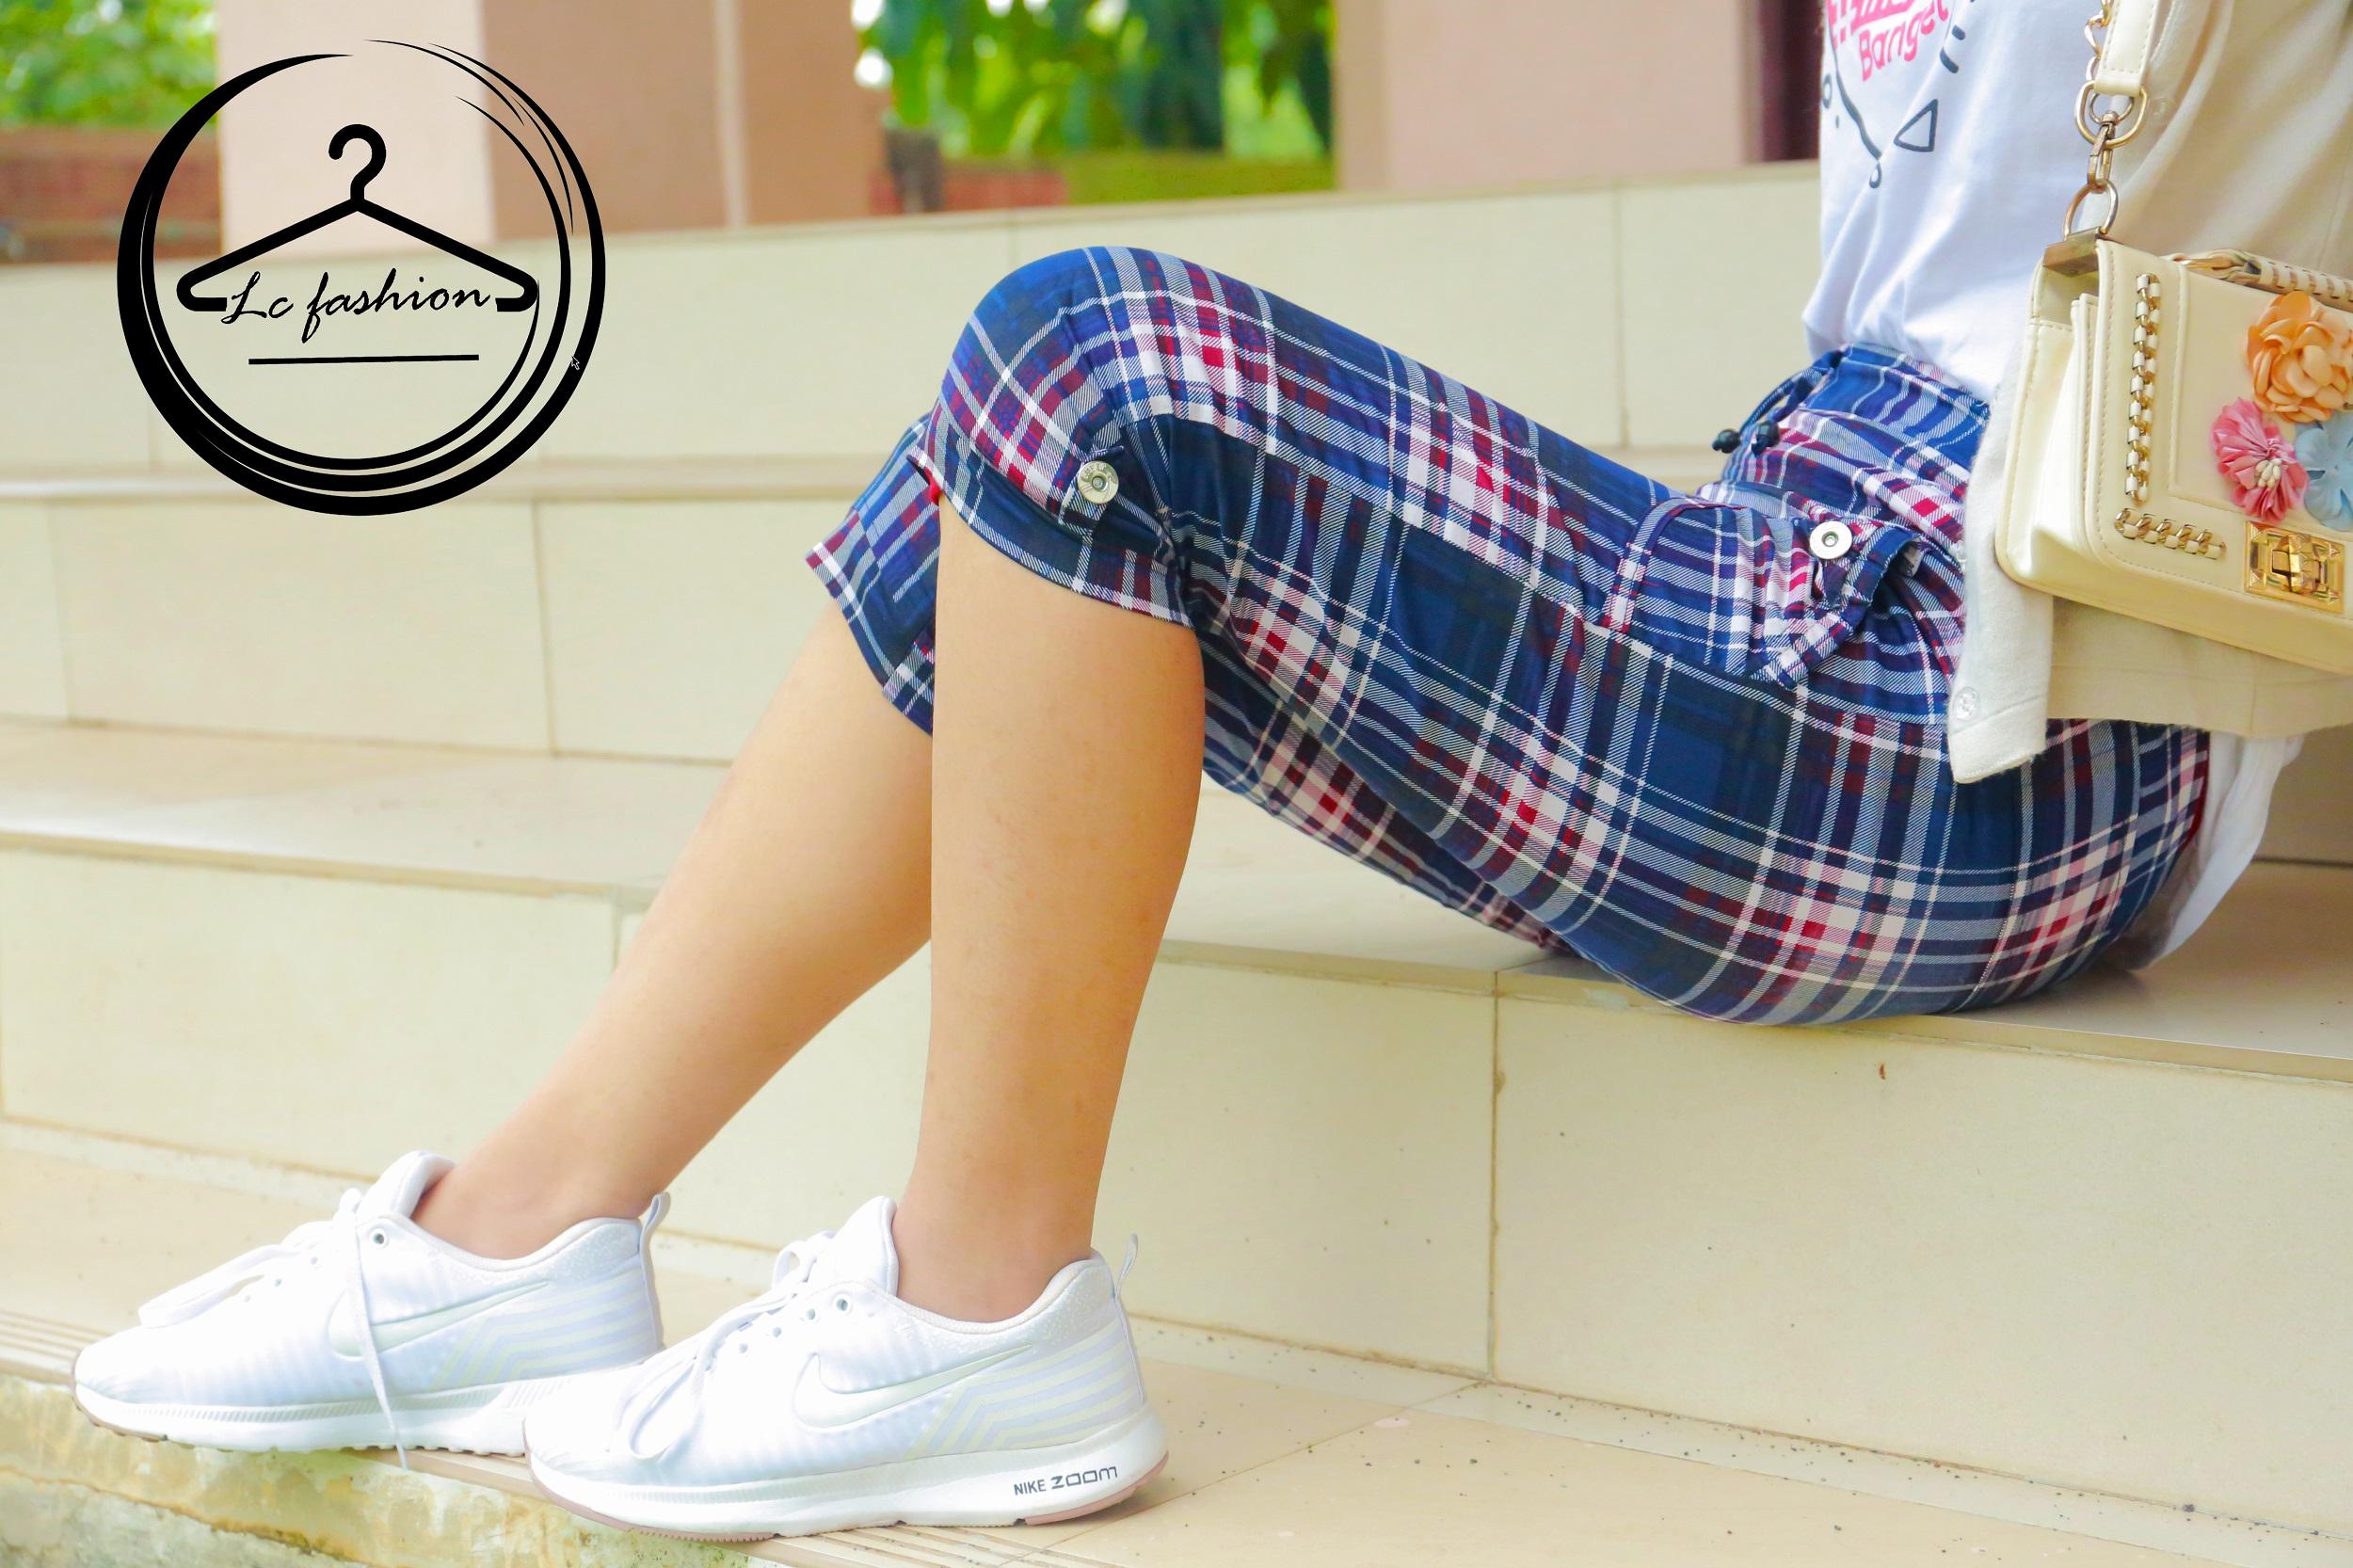 lc fs [ new promo] celana panjang wanita katun polos kasual original / bawahan perempuan  / xl xxl [ bb45-60kg bb 60-80kg] hitam / abu abu / krem / celana doty  katun  / cod /free ongkir / promo diskon